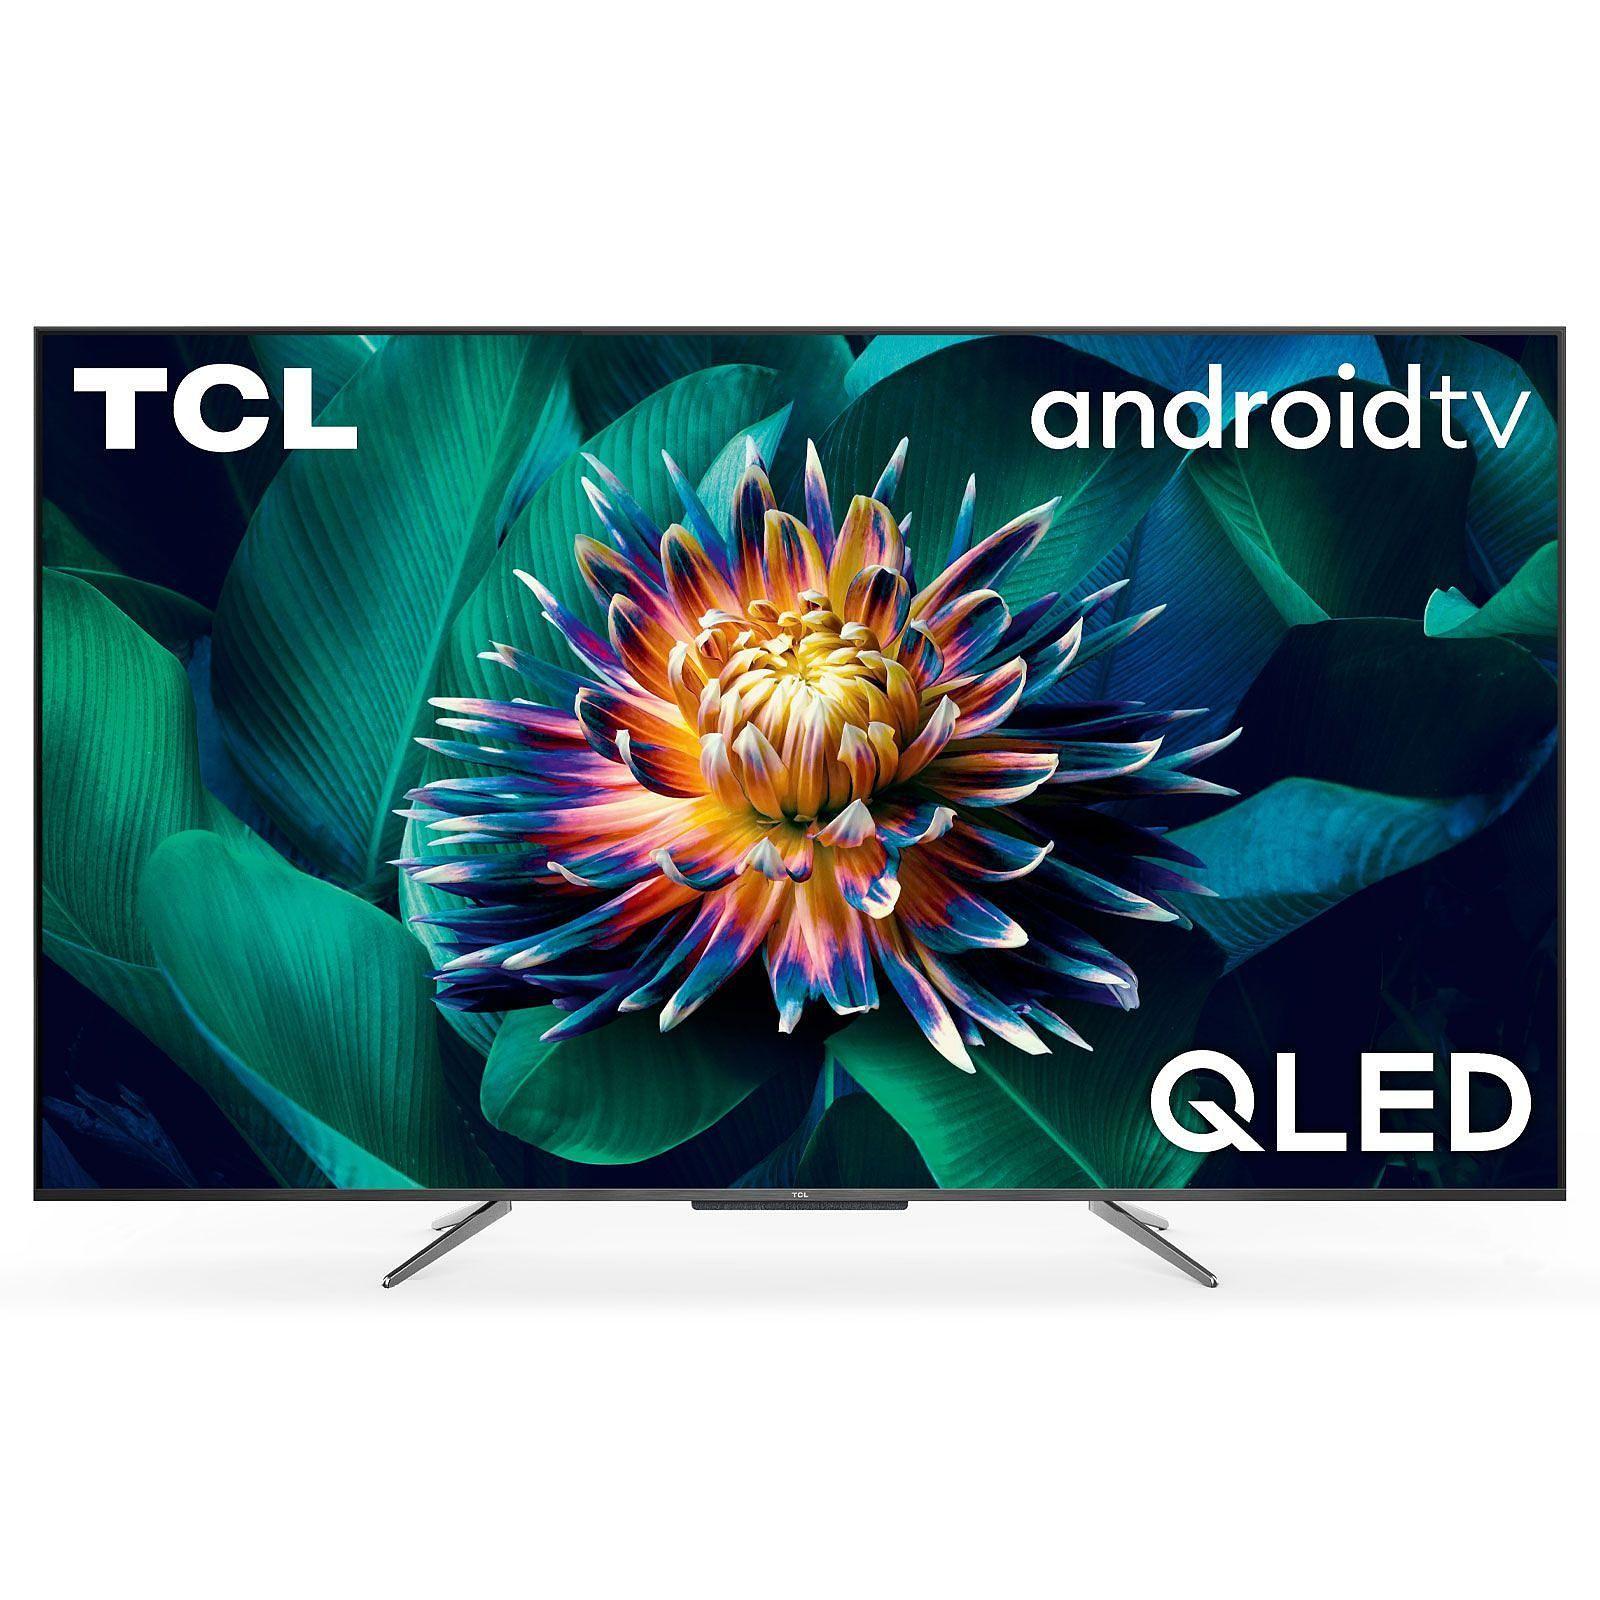 "TV 55"" TCL 55C711 - QLED, 4K UHD, HDR 10+, Dolby Vision, Android TV (469€ avec RAKUTEN30 + 28.45€ en SuperPoints) - Via ODR de 100€ (Ubaldi)"